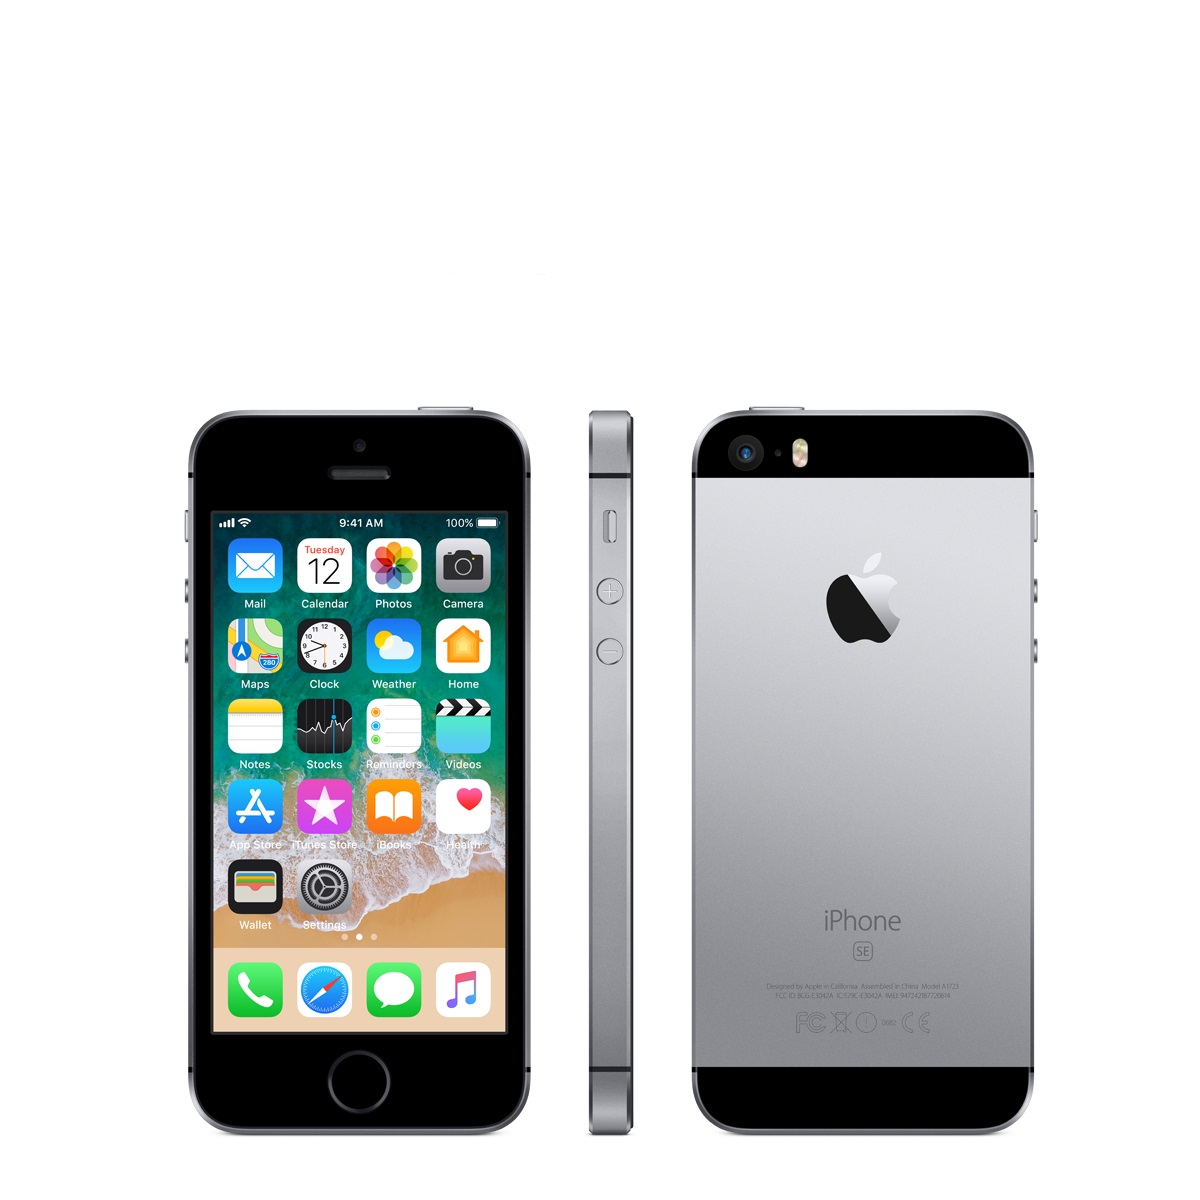 iphone se apple authorised reseller. Black Bedroom Furniture Sets. Home Design Ideas